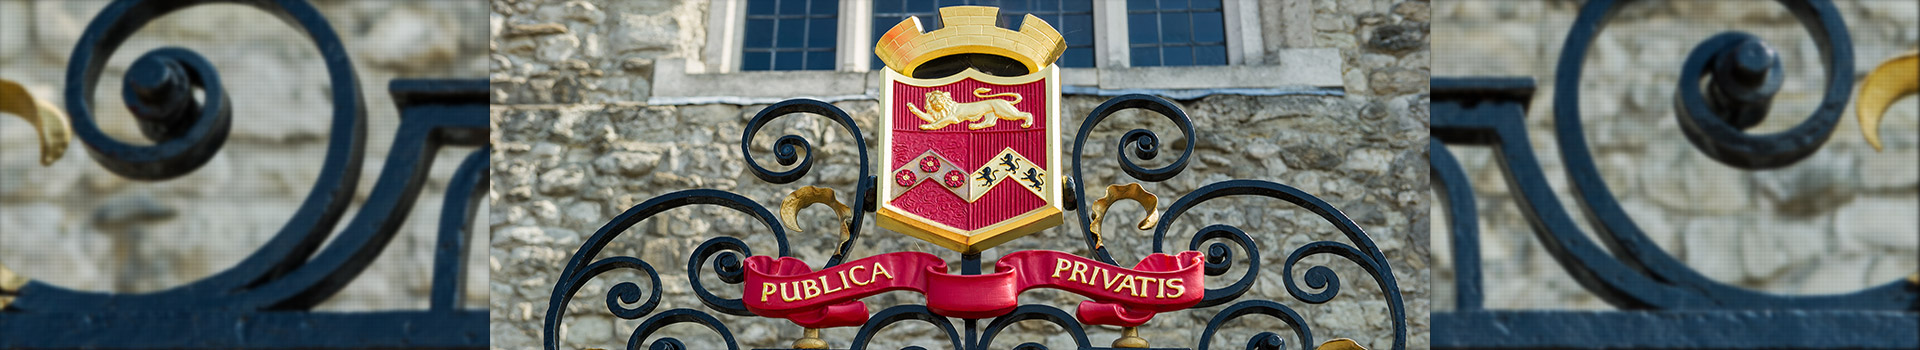 Chapel Crest Banner 1